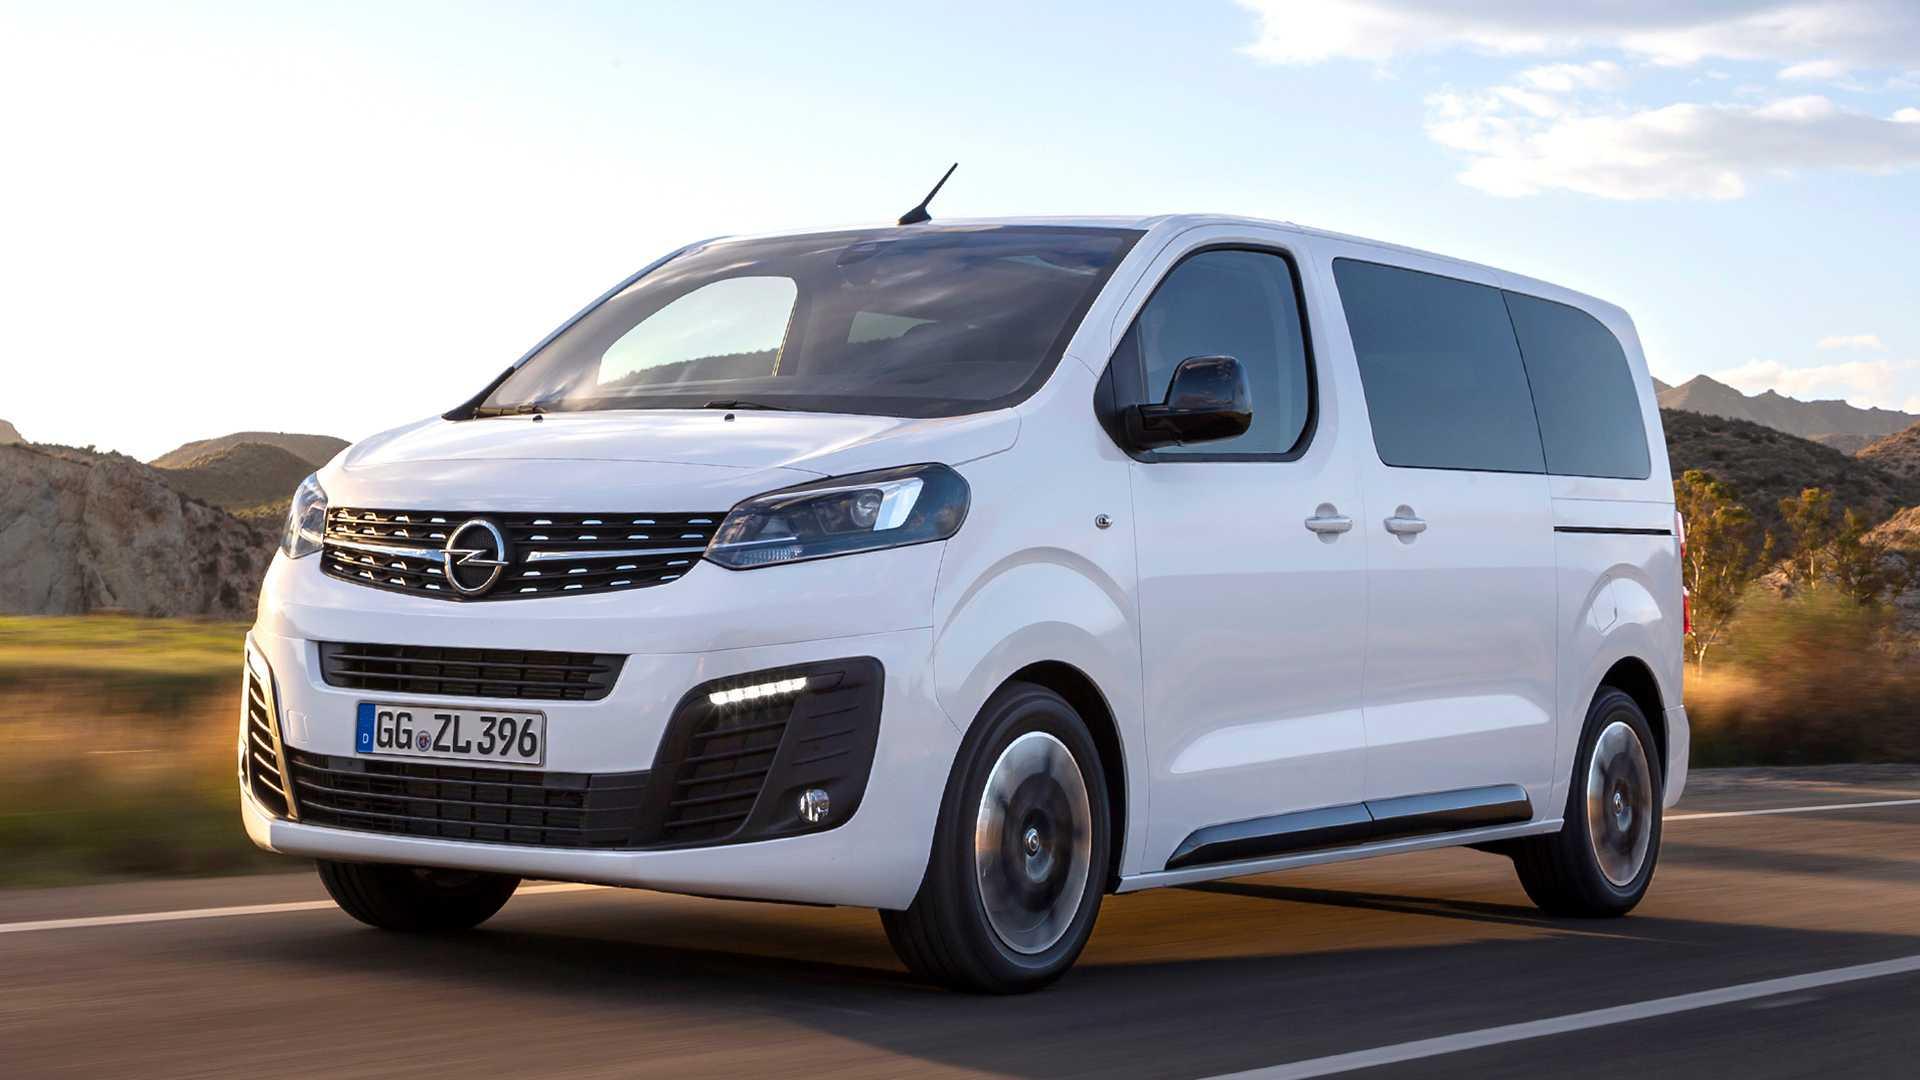 82 The Neuer Opel Vivaro 2020 Redesign for Neuer Opel Vivaro 2020